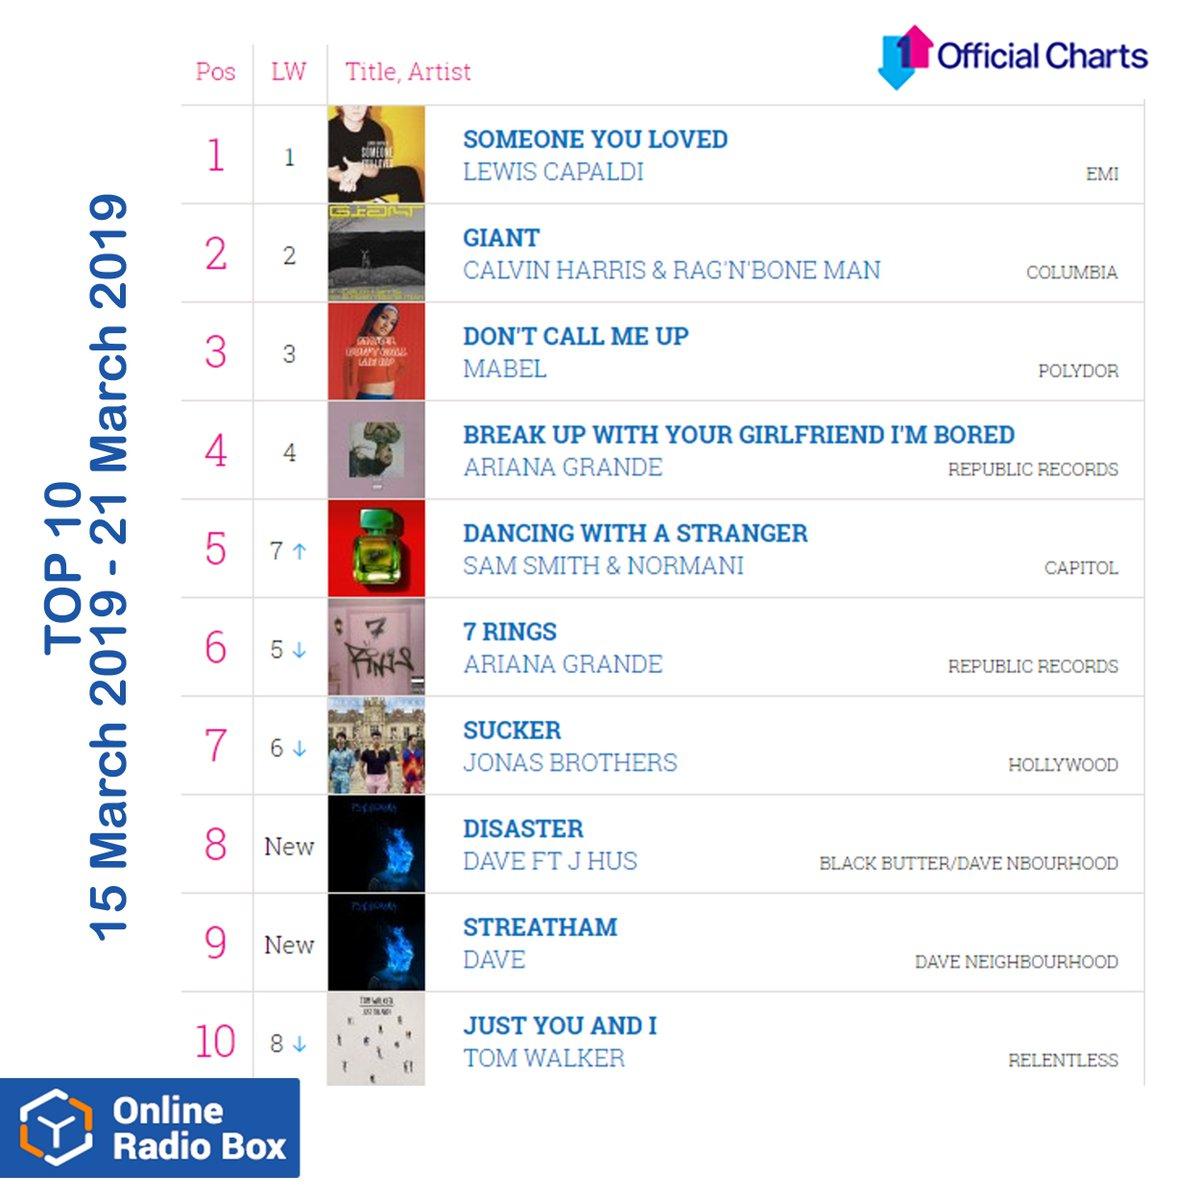 uk top 40 singles march 2019